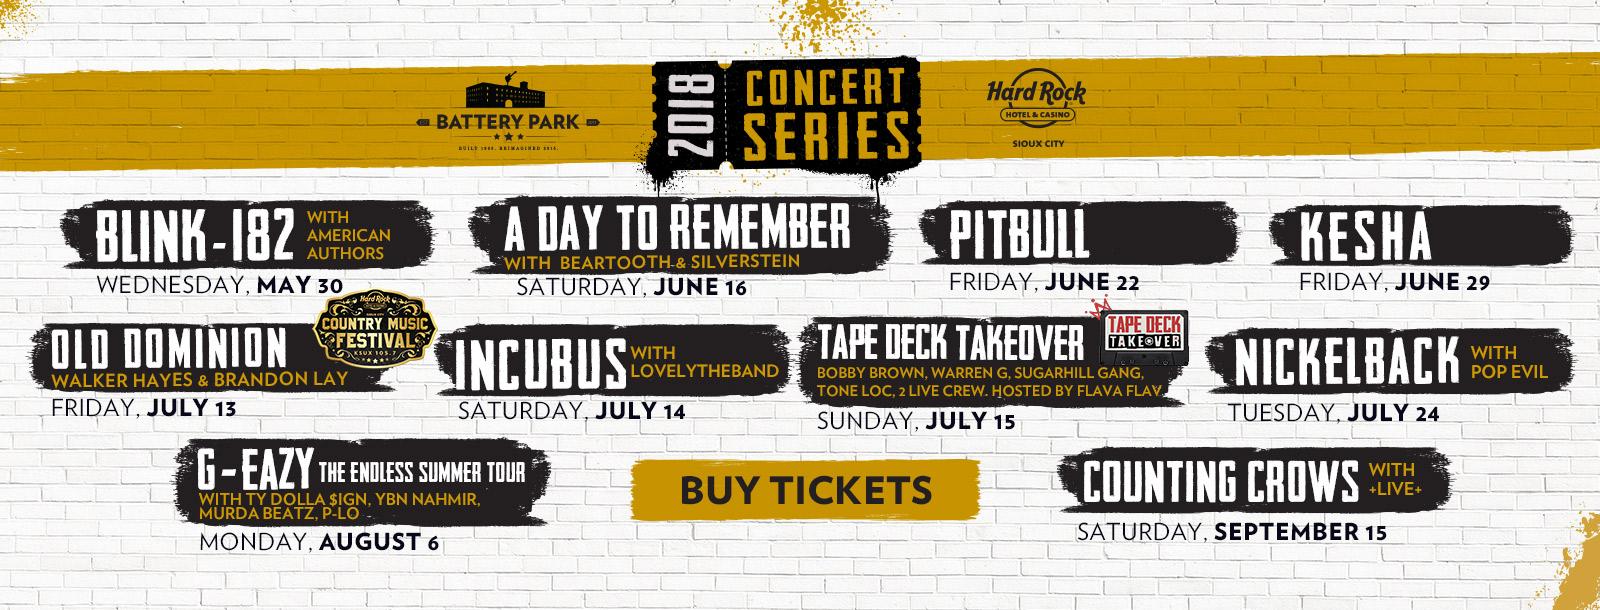 battery park 2018 concert series